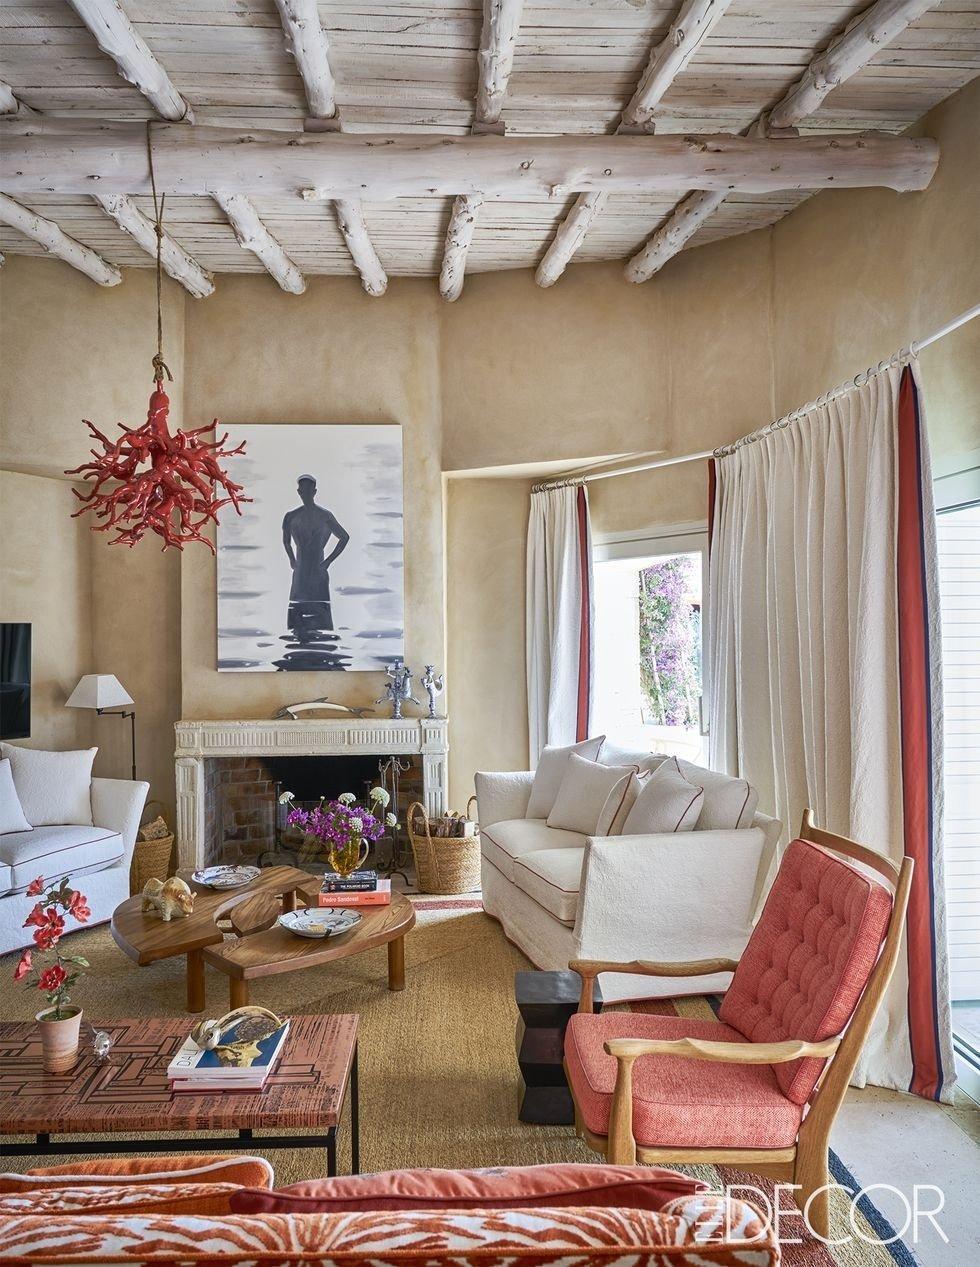 10 Cute Living Room Window Treatment Ideas 40 living room curtains ideas window drapes for living rooms 8 2020